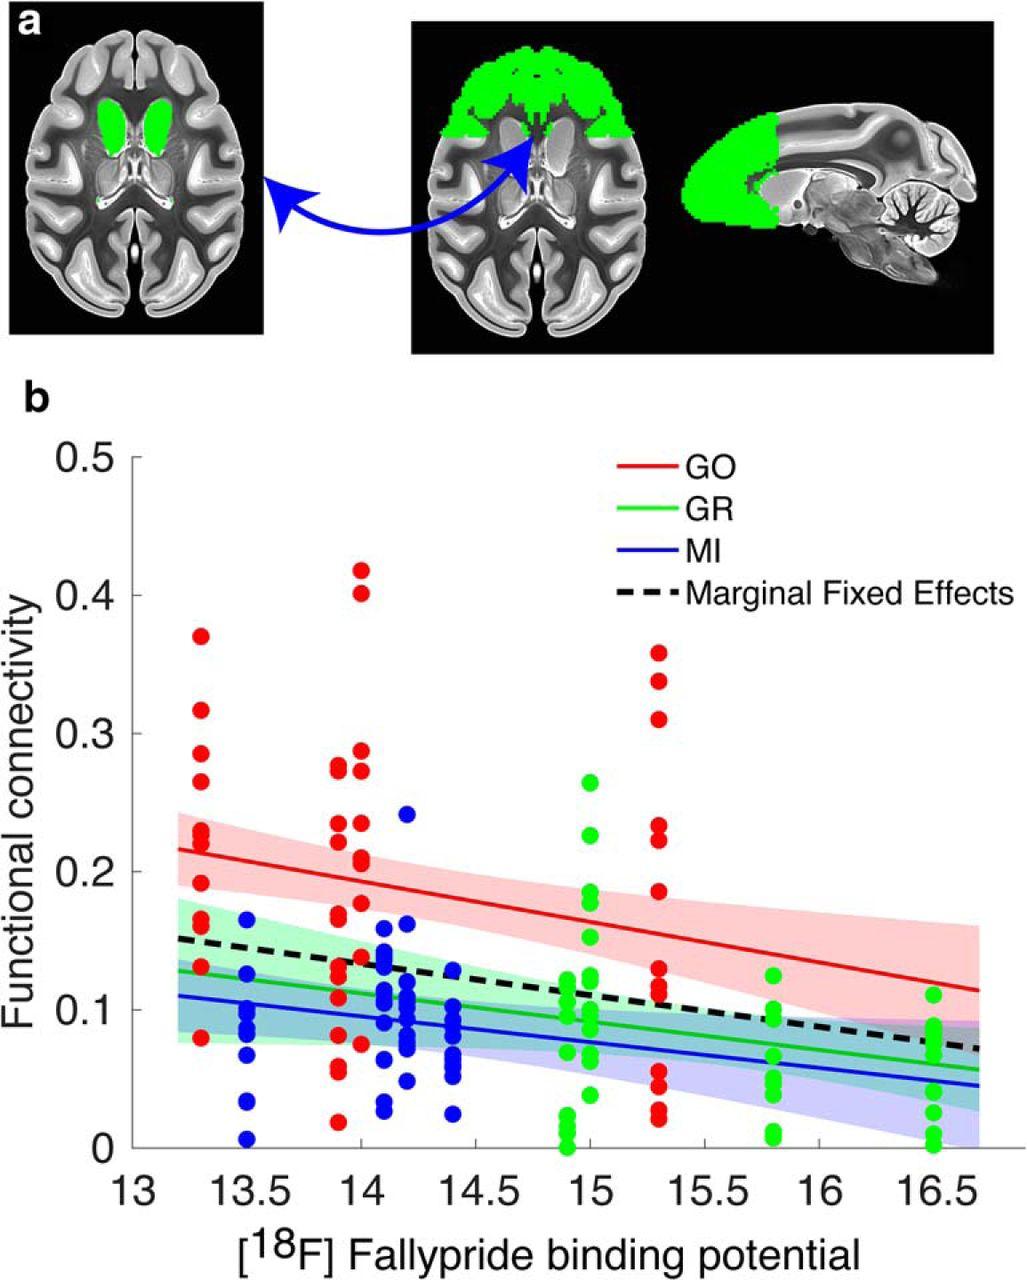 Changes in Endogenous Dopamine Induced by Methylphenidate Predict